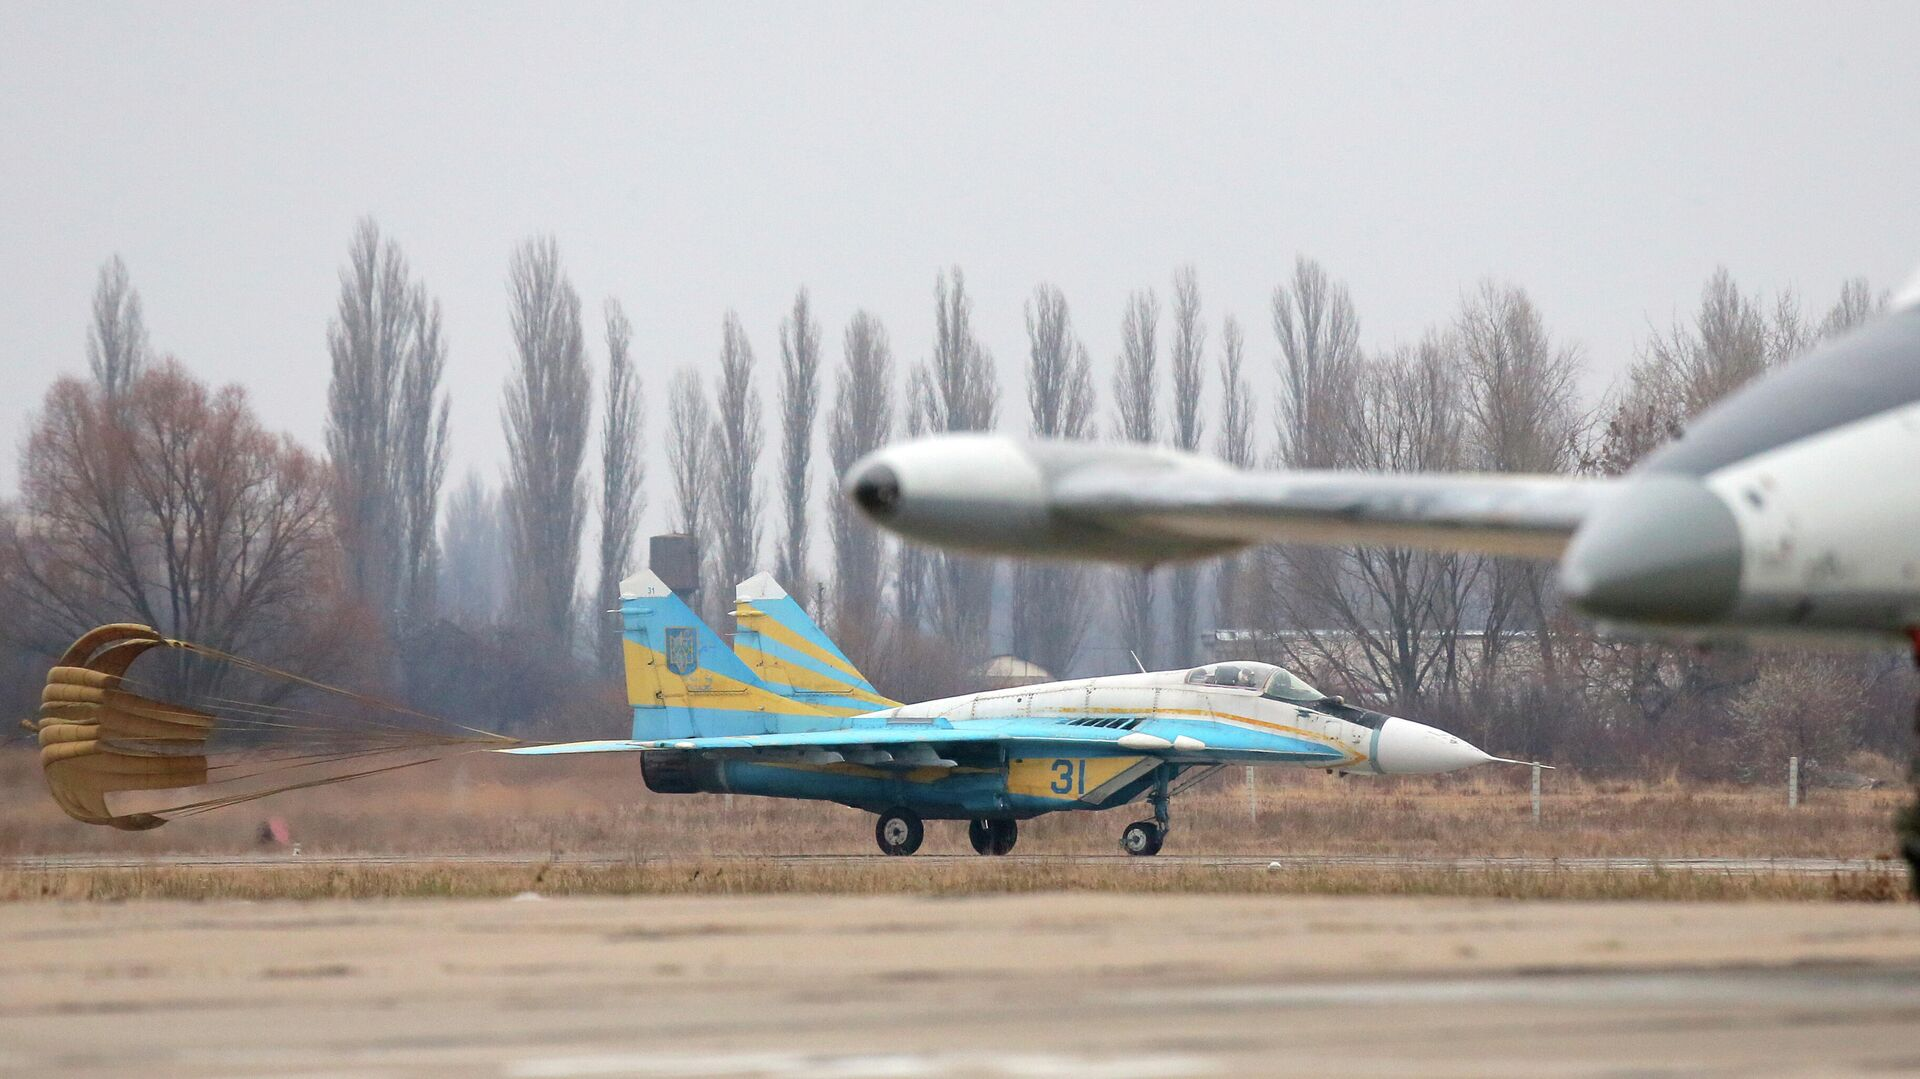 Истребитель Миг-29 на авиабазе недалеко от Киева - РИА Новости, 1920, 12.03.2021